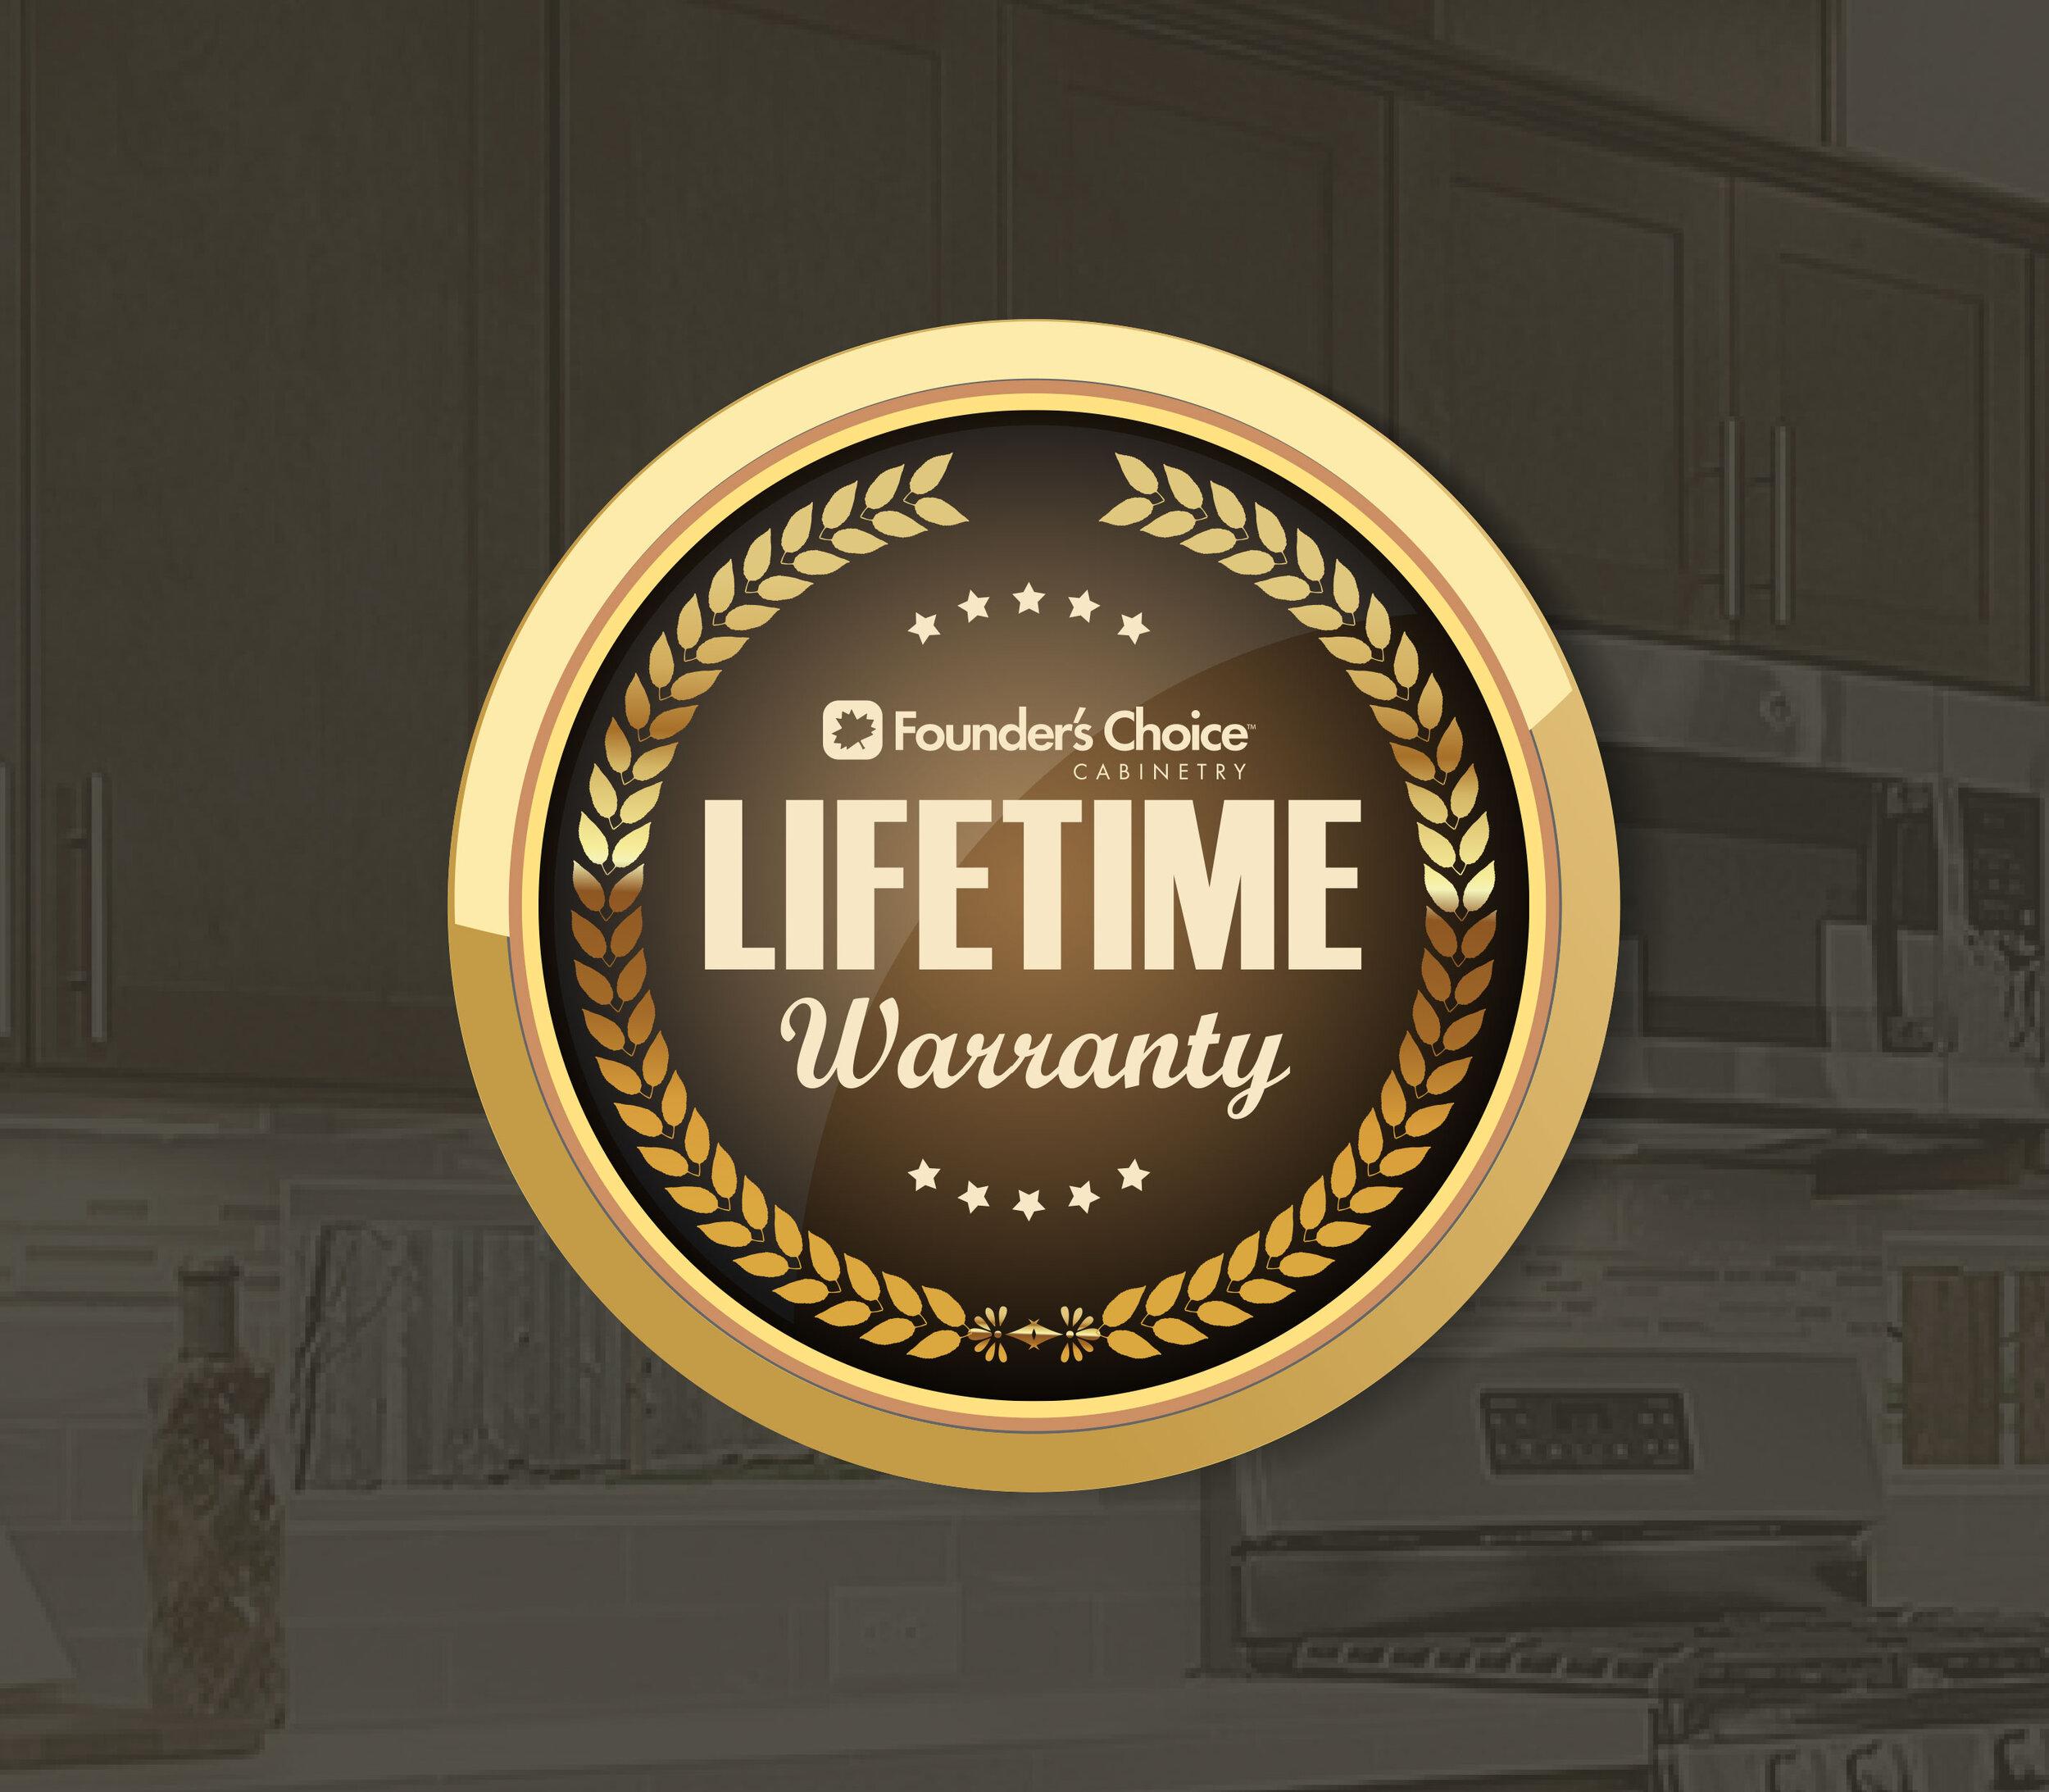 Founders-Choice-Lifetime-Warranty.jpg